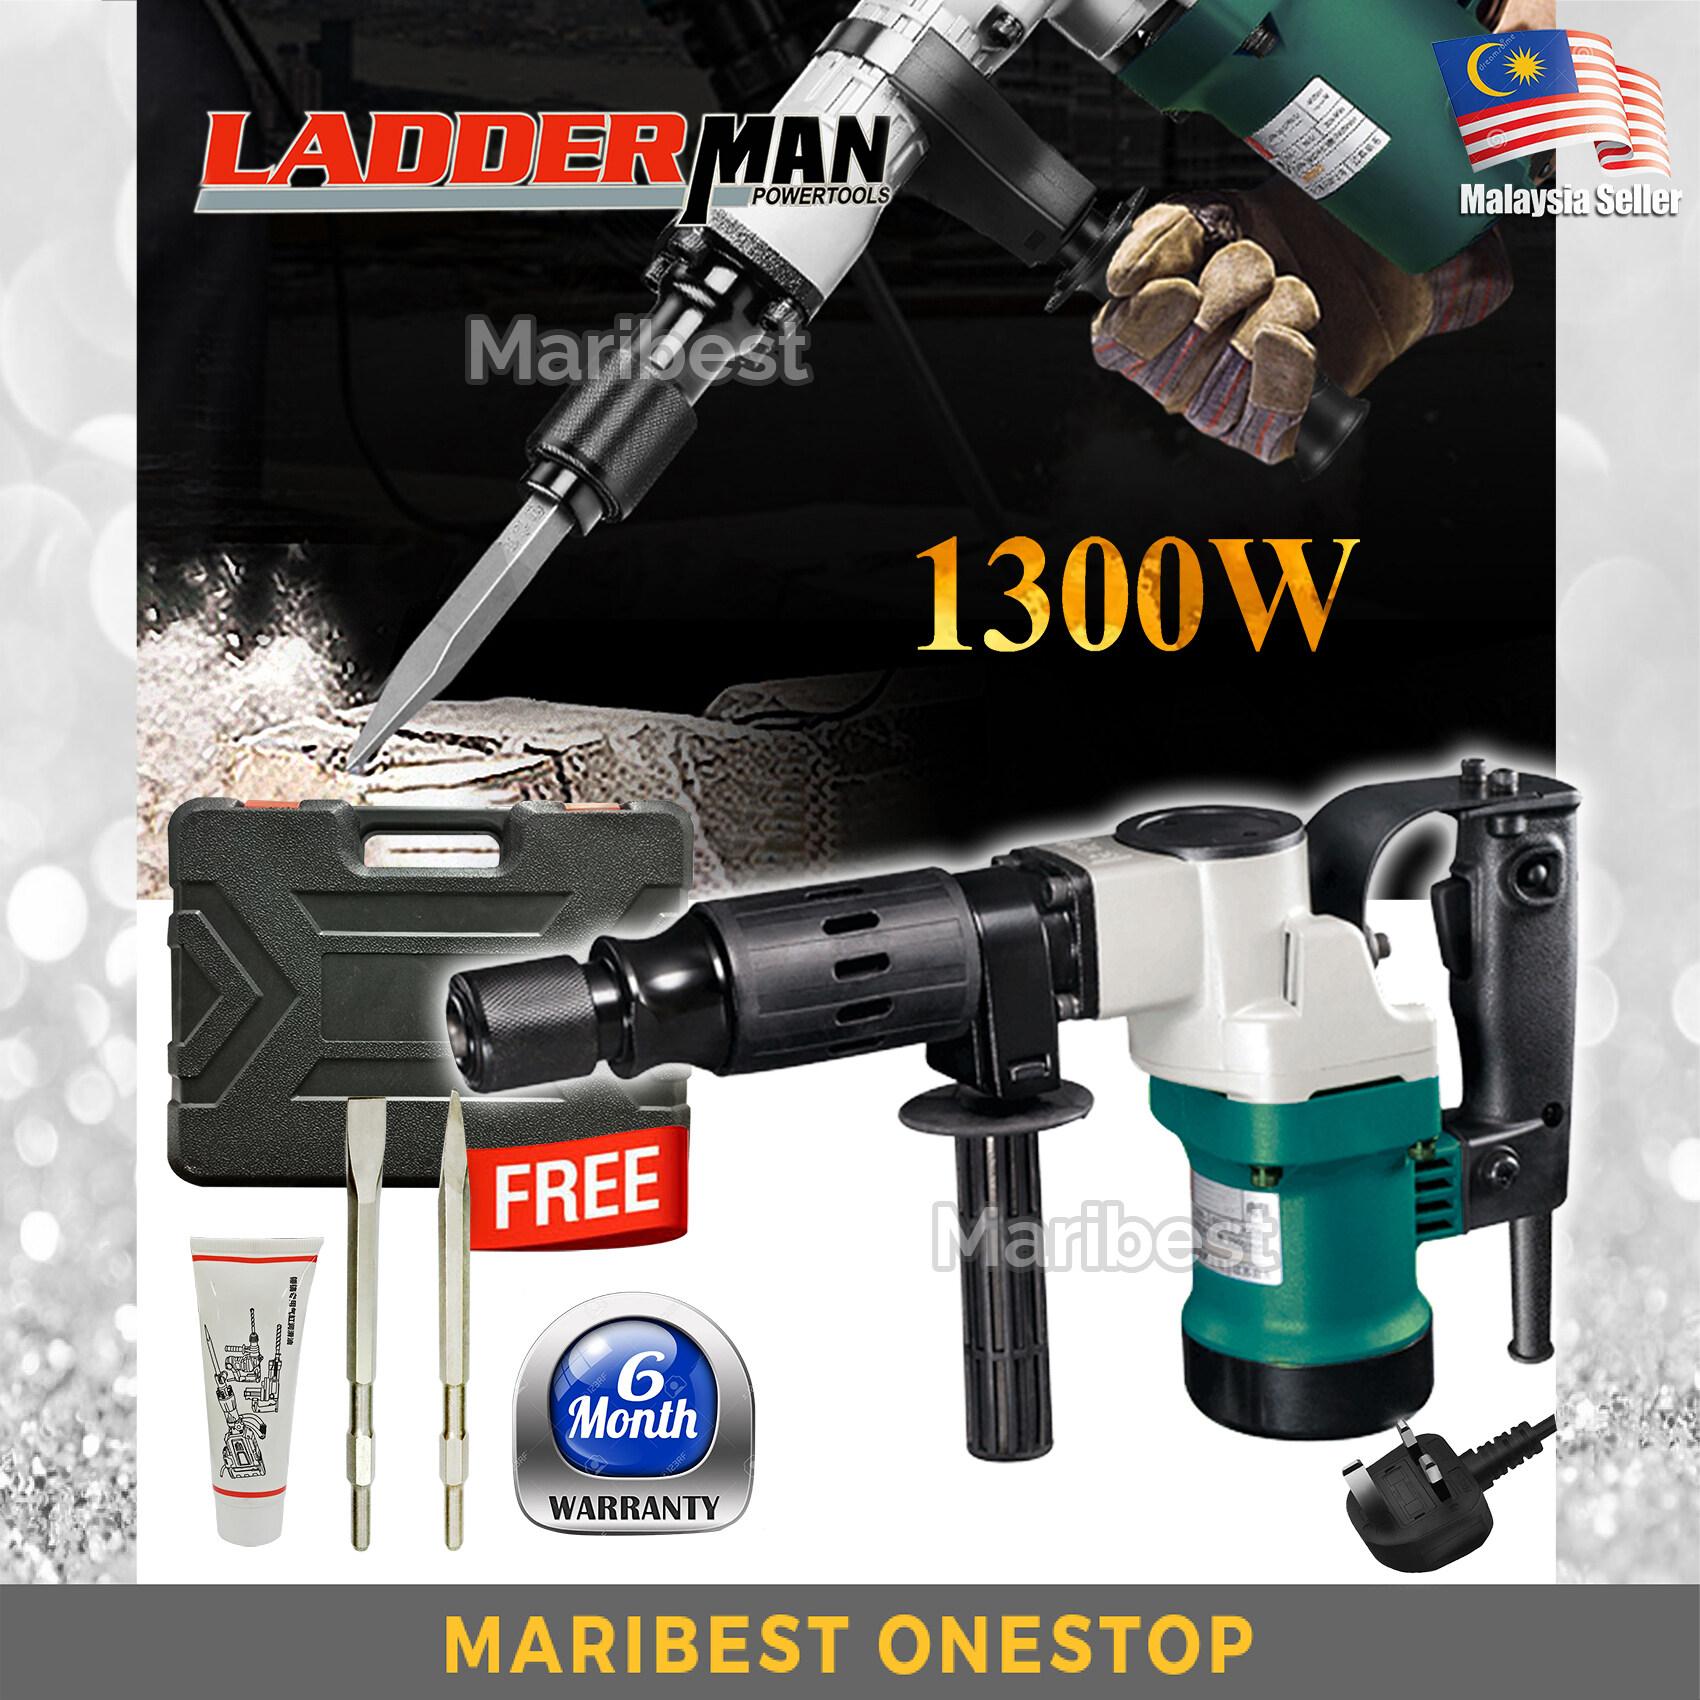 Ladderman 0810 1300W Demolition Hammer Electric Hammer Pick Break Concrete Chisel Free Accessories